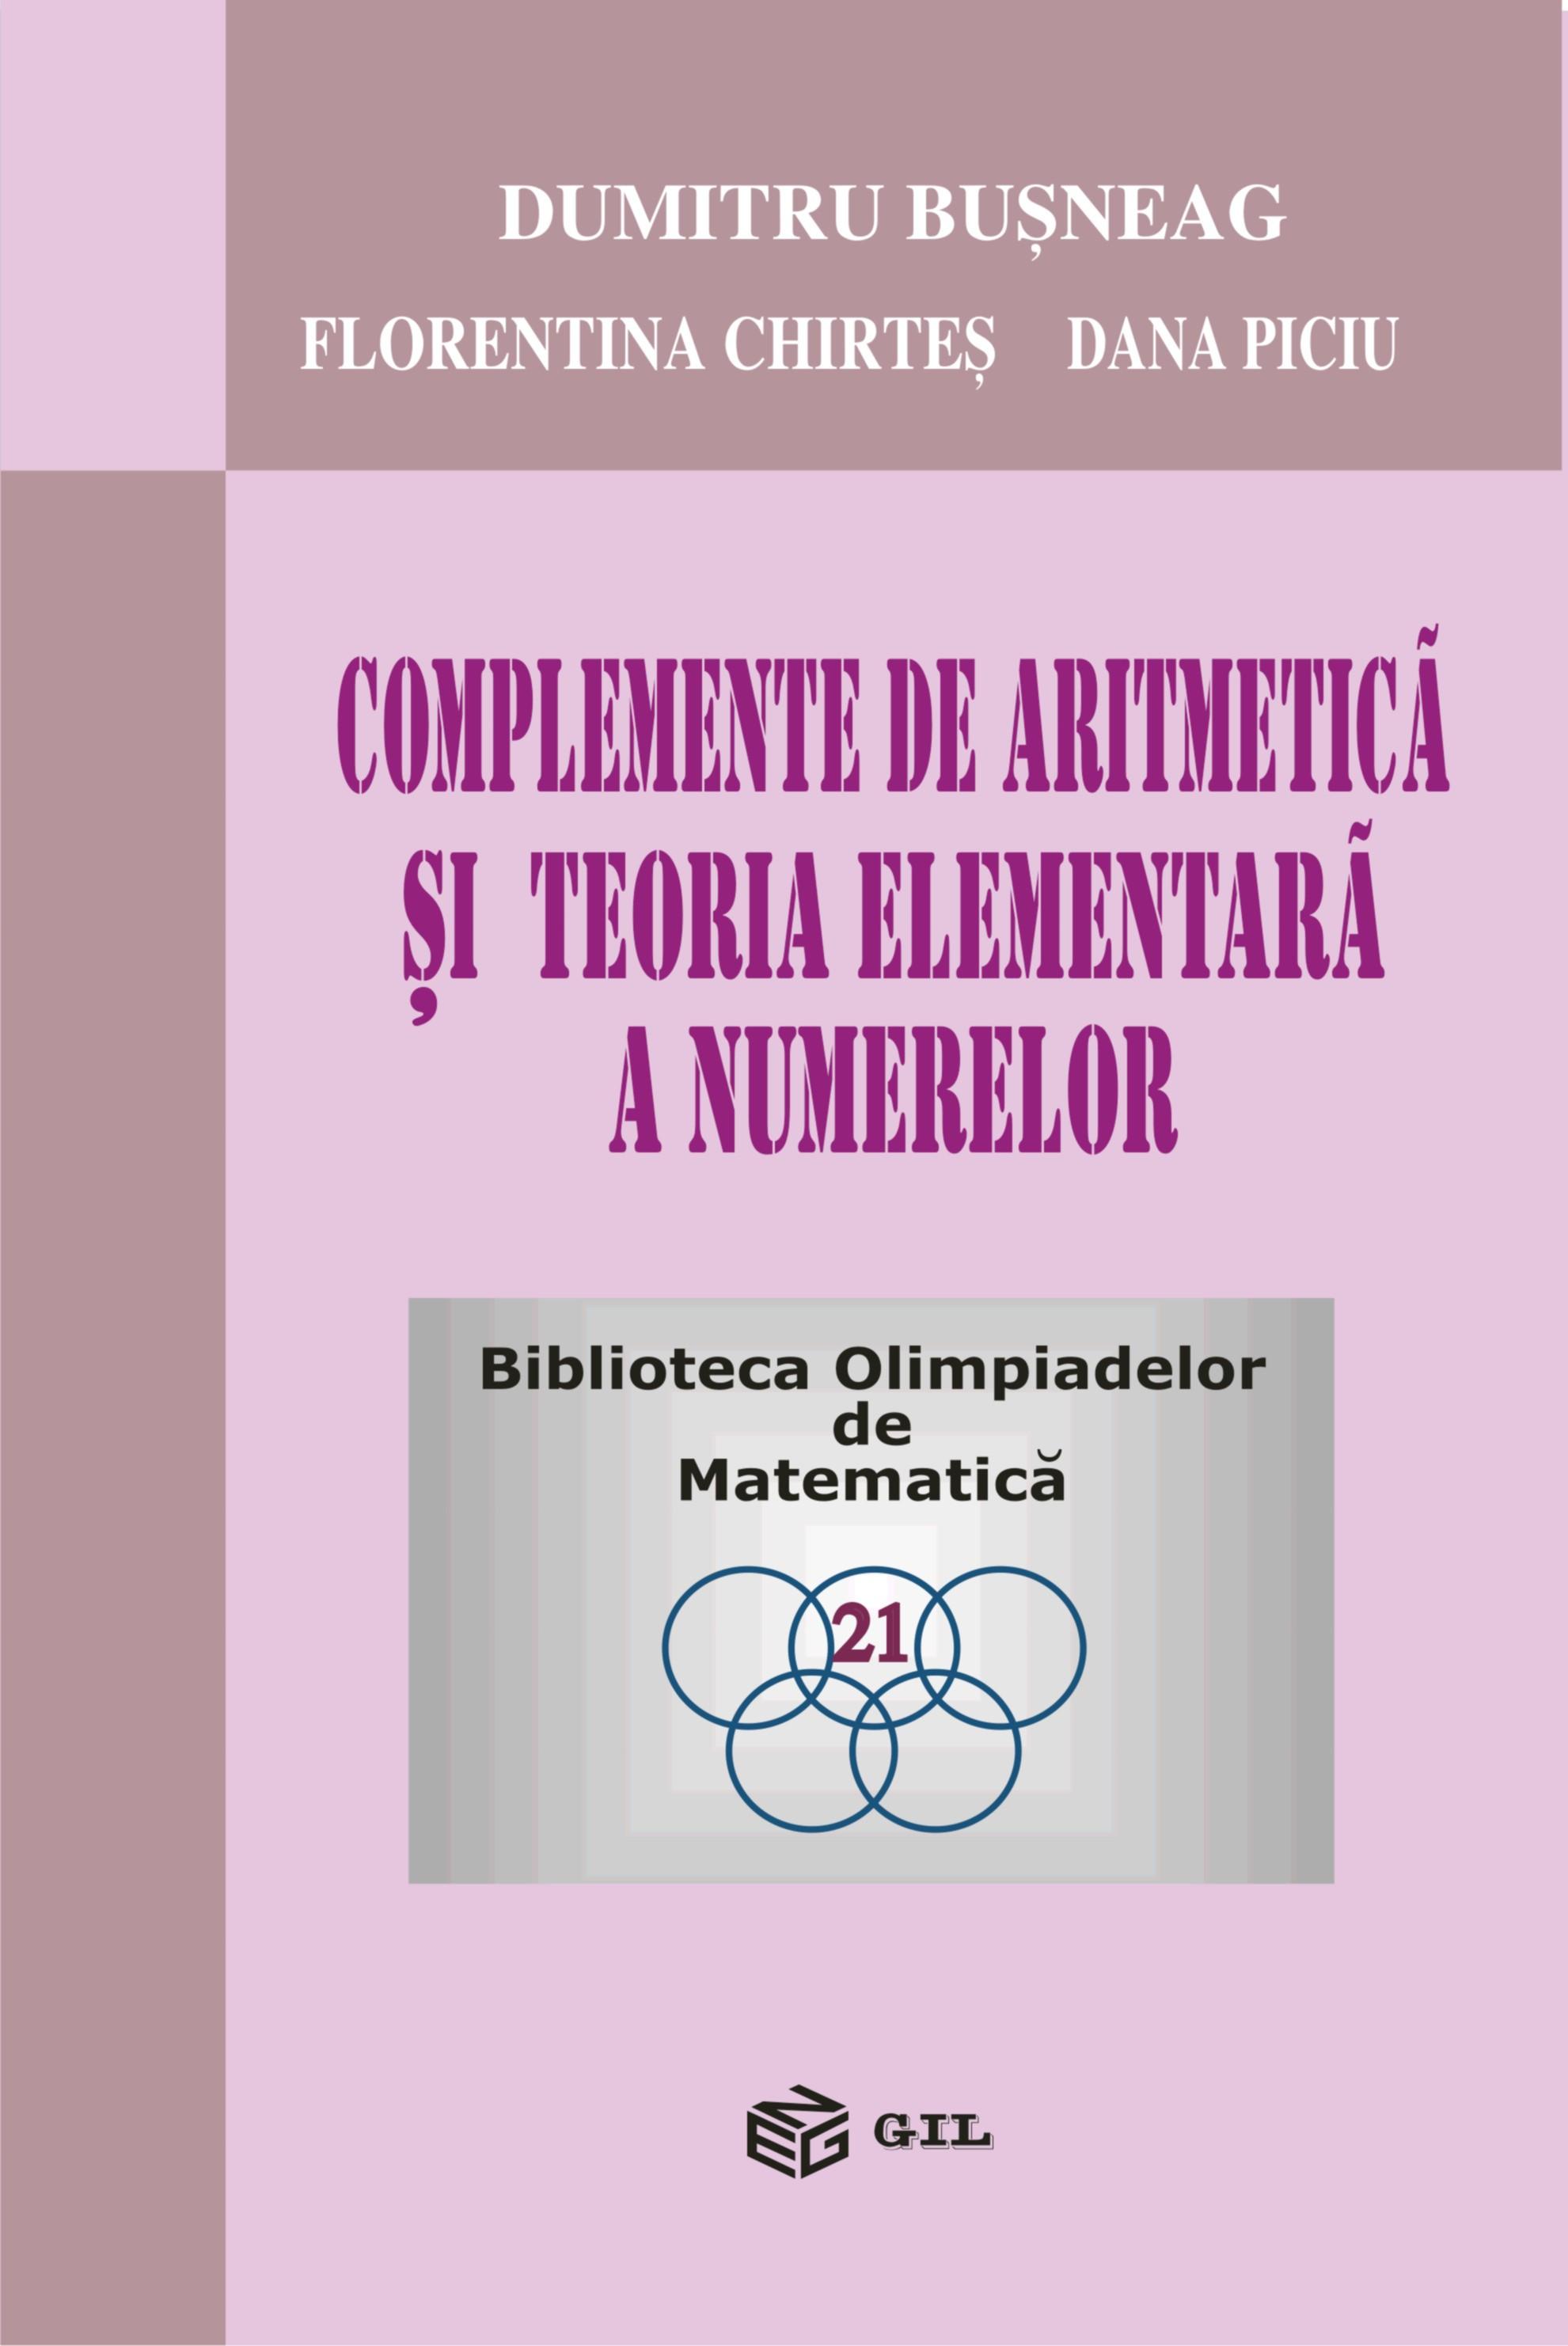 Complemente de aritmetica si teoria elementara a numerelor